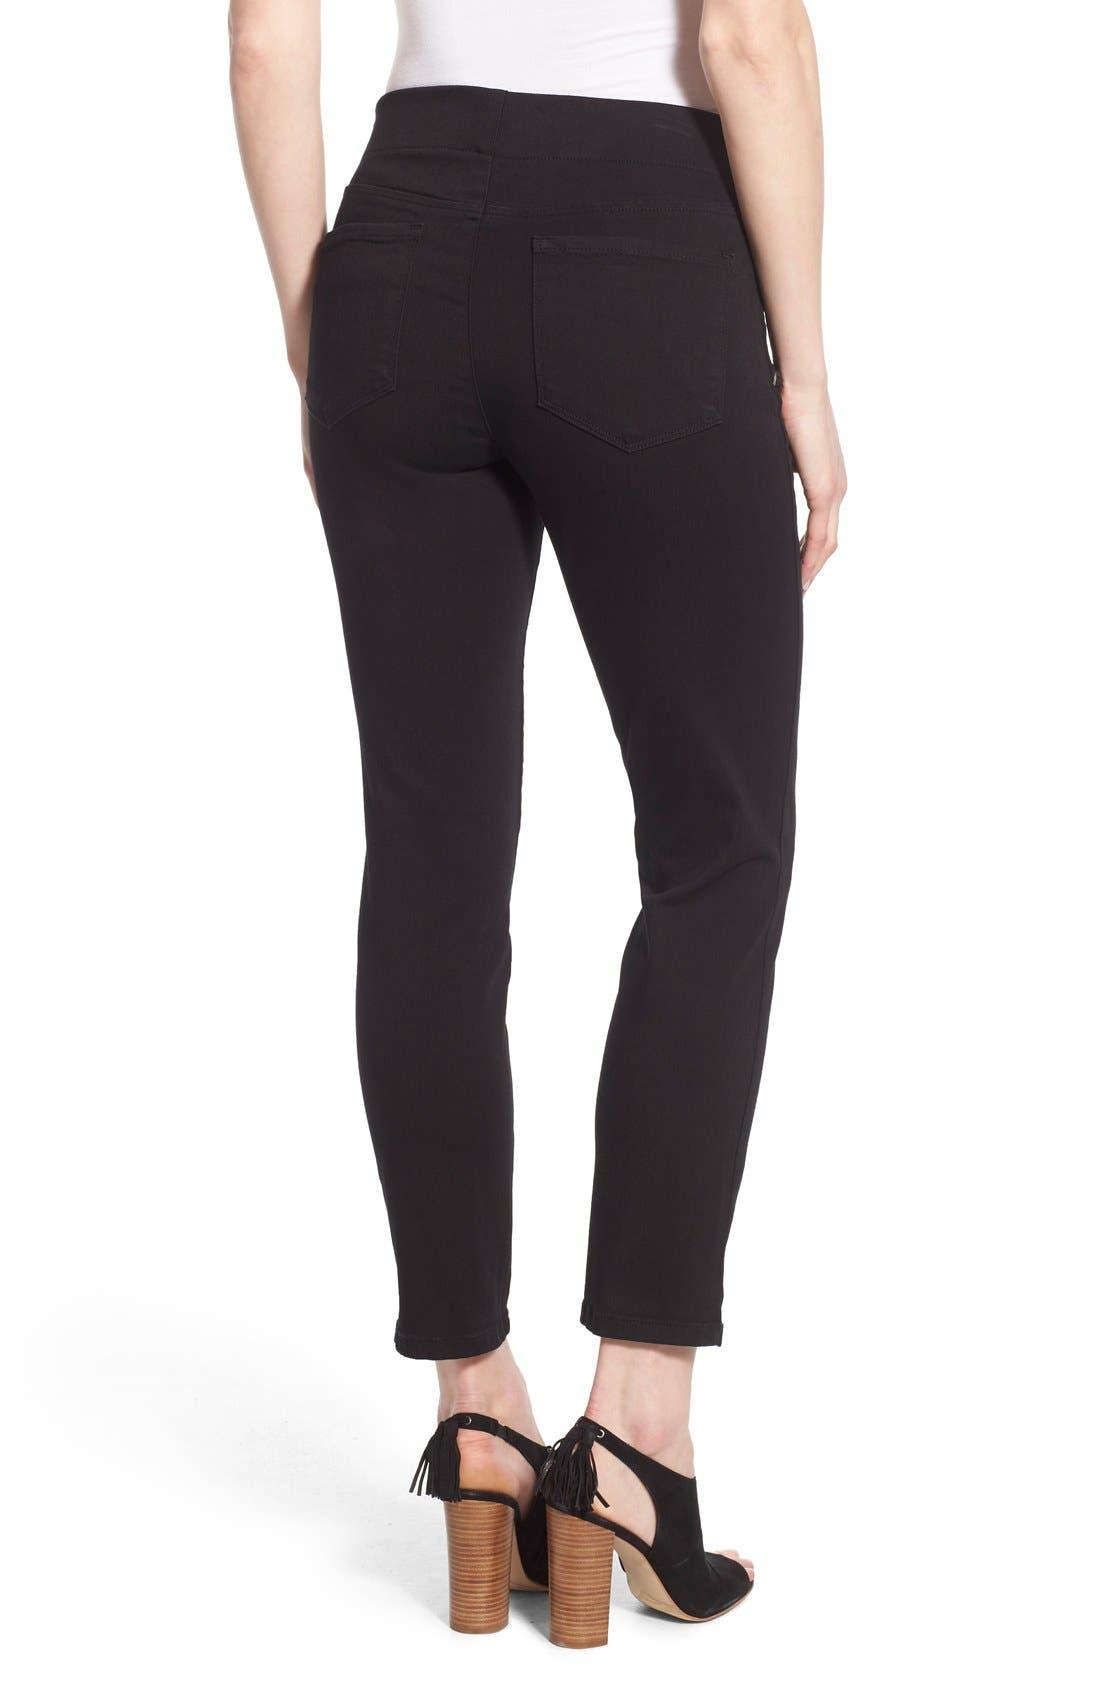 Alternate Image 2  - NYDJ Millie Pull-On Stretch Ankle Skinny Jeans (Regular & Petite)